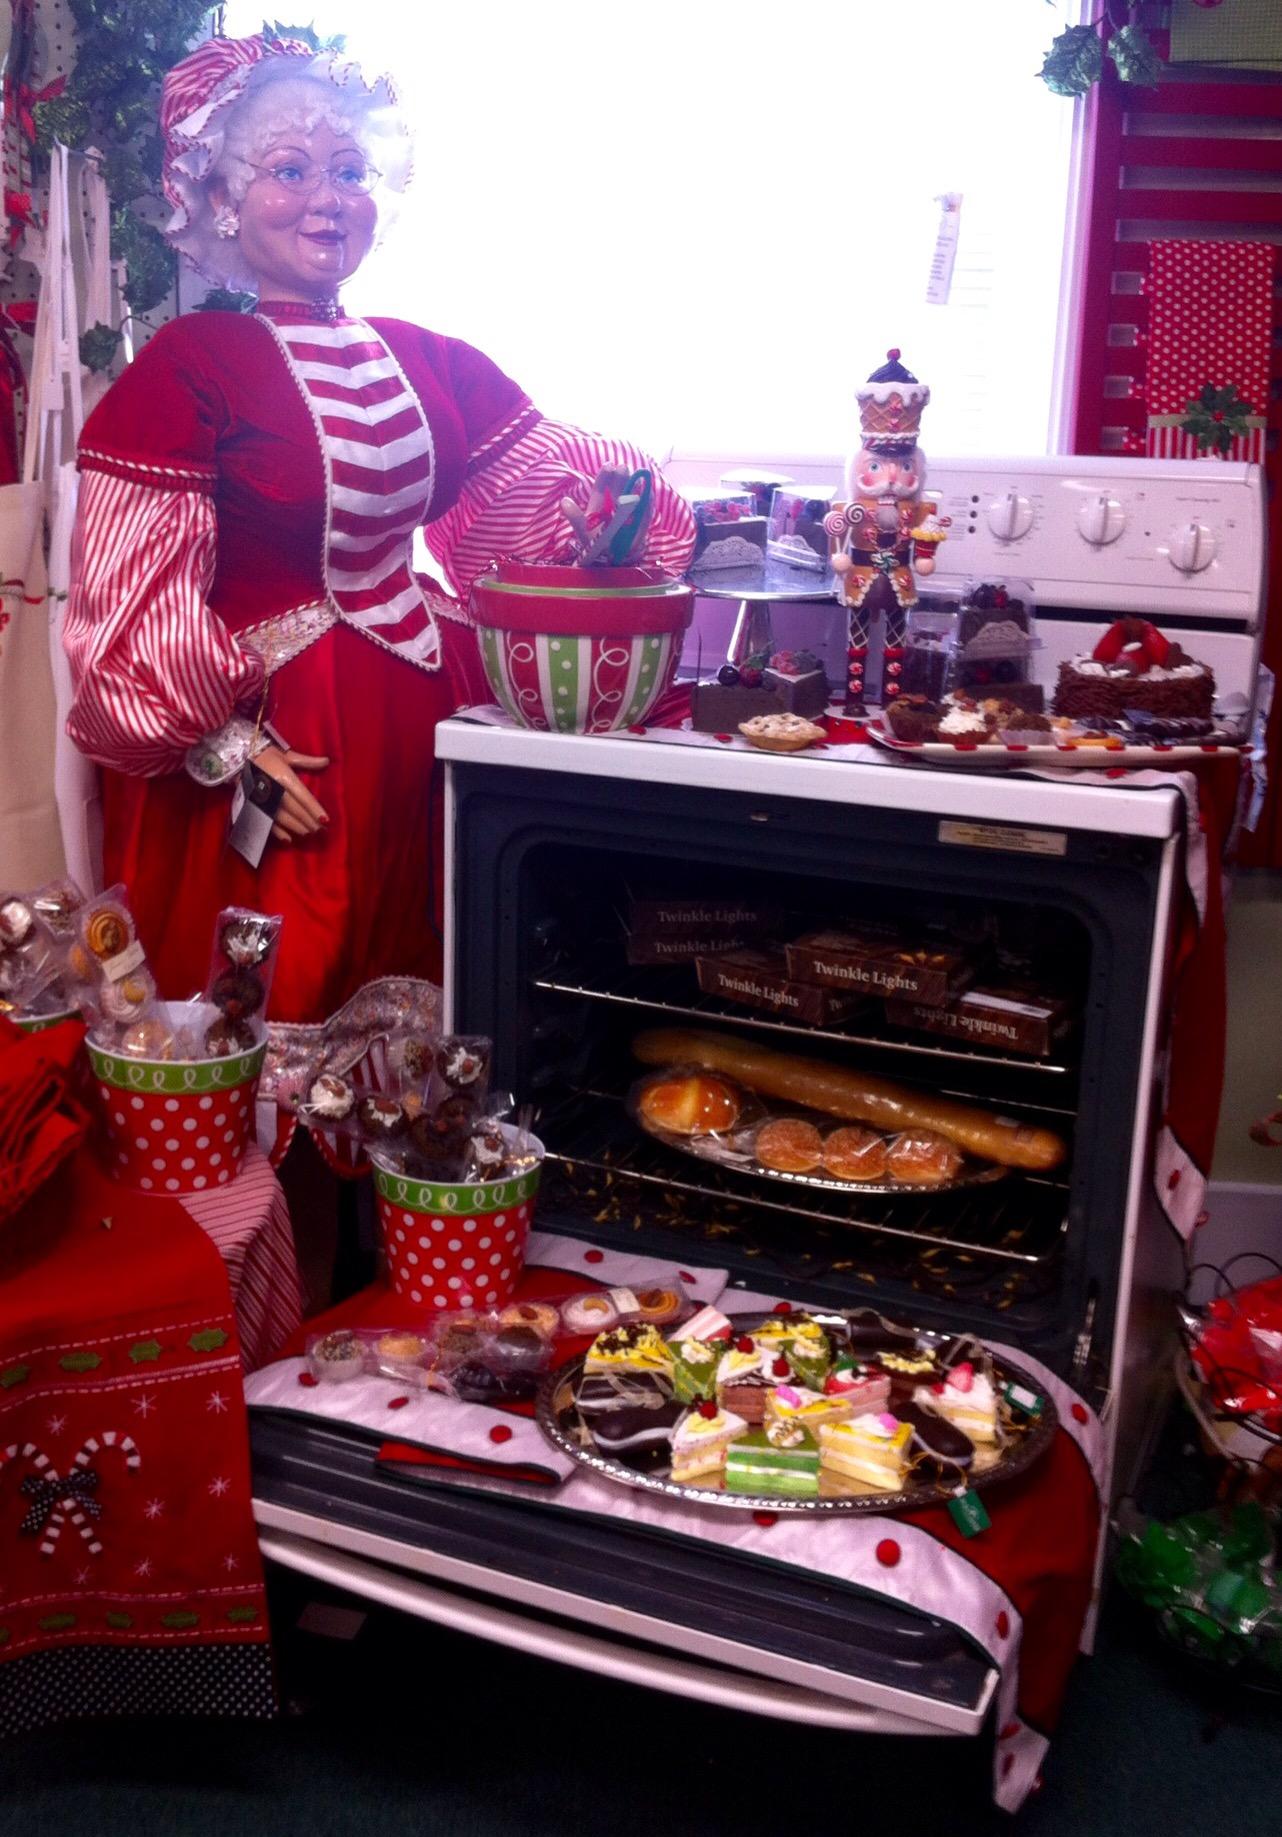 Frohe Weihnachten – Merry Christmas -Feliz Navidad – Auf\'m Weg into ...